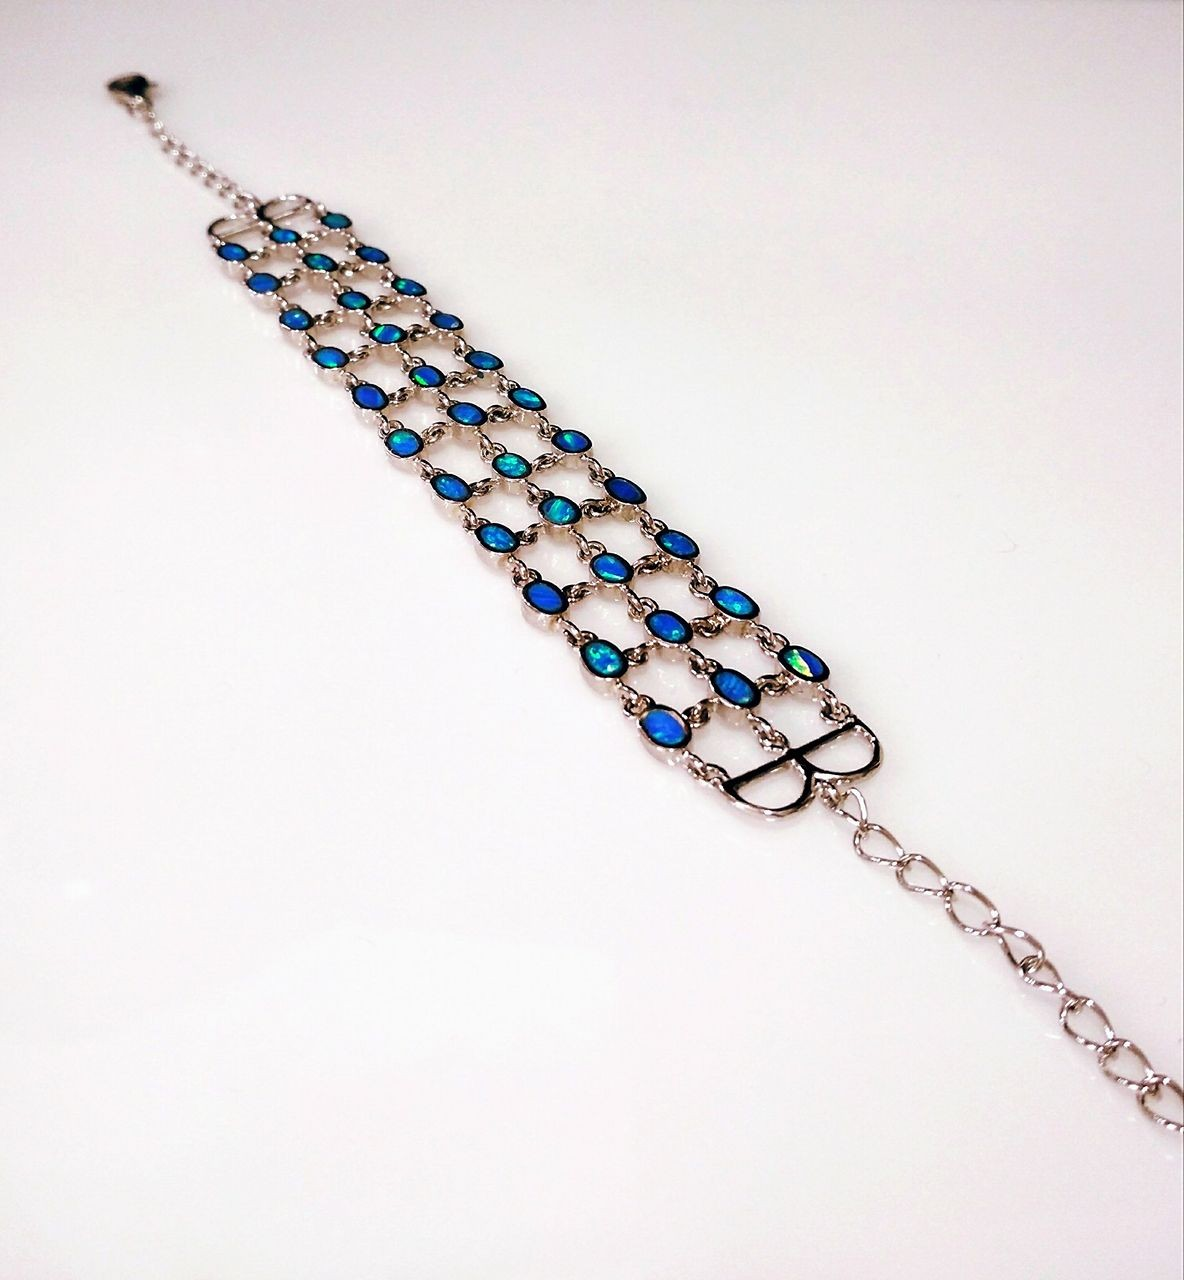 Handmade 925 Silver Bracelet  (8mm X 19,5cm)